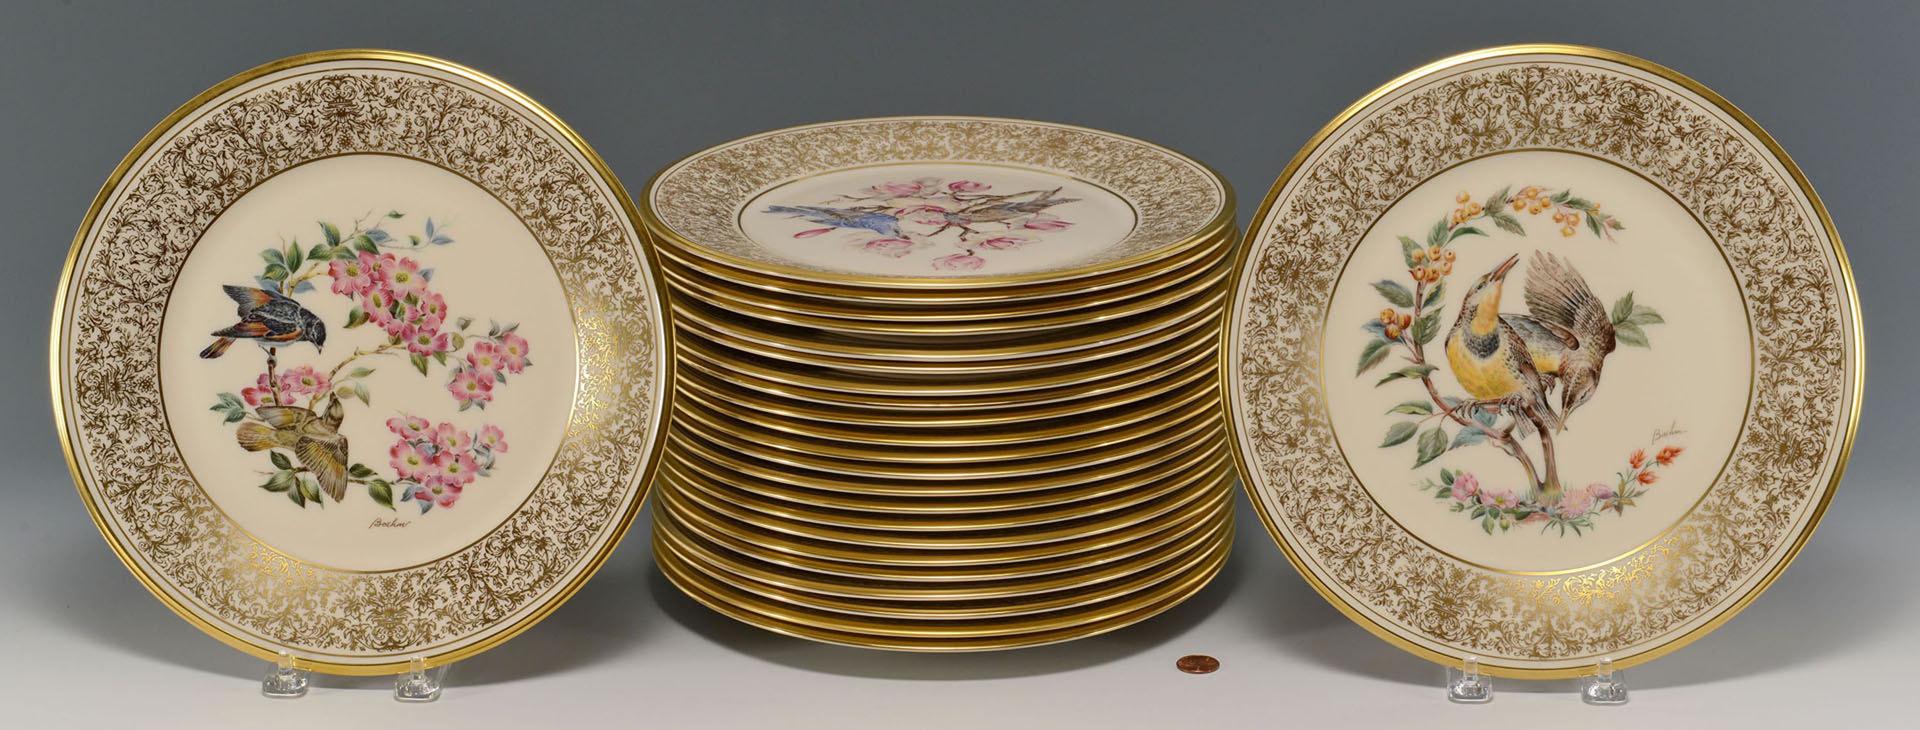 Lot 670: 24 Boehm Bird Plates by Lenox